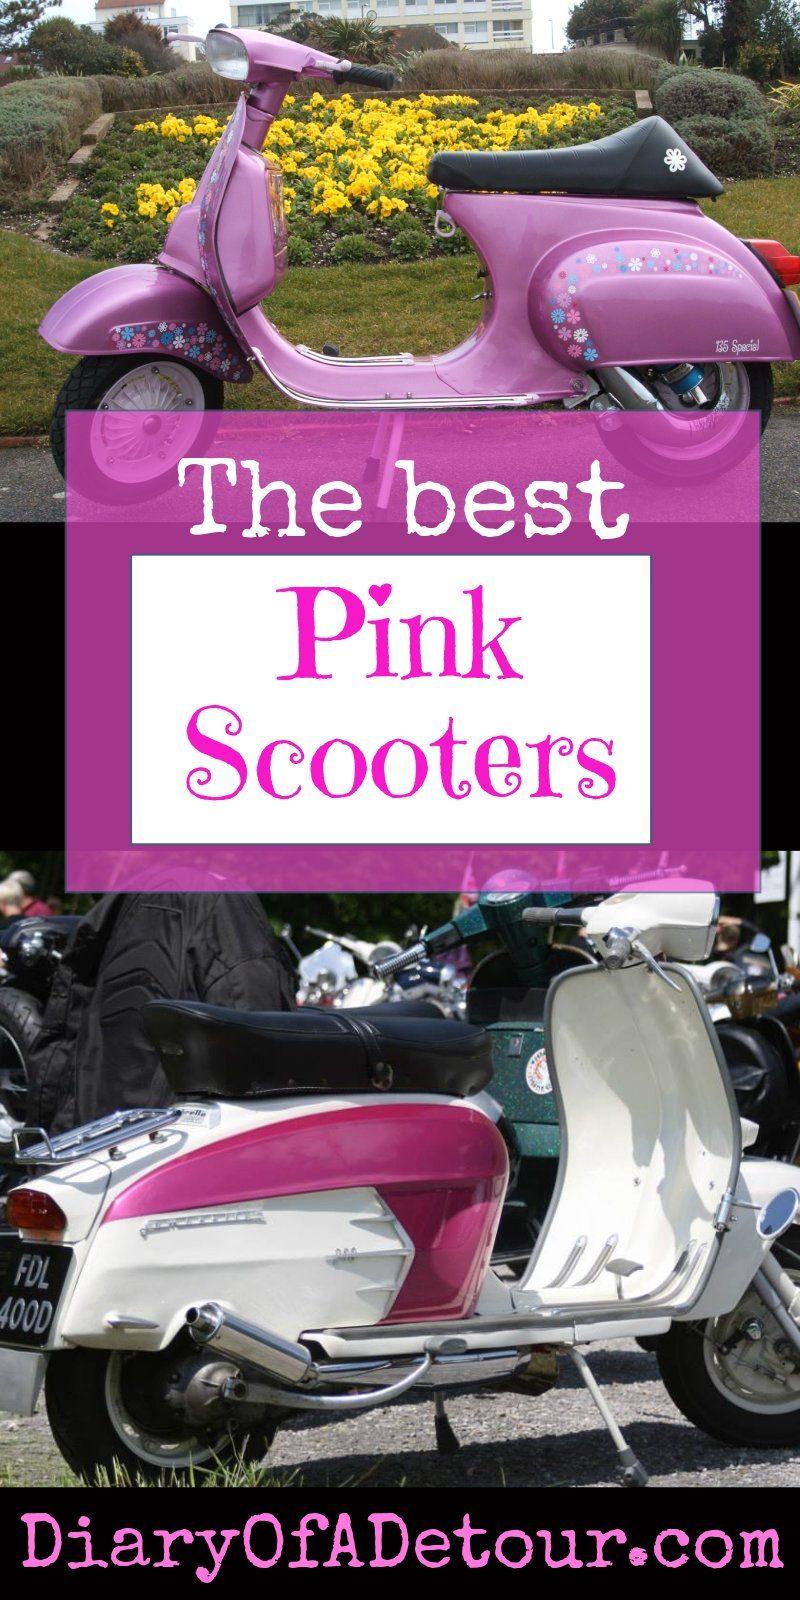 Pink scooters including smallframe Vespa and SX Lambretta